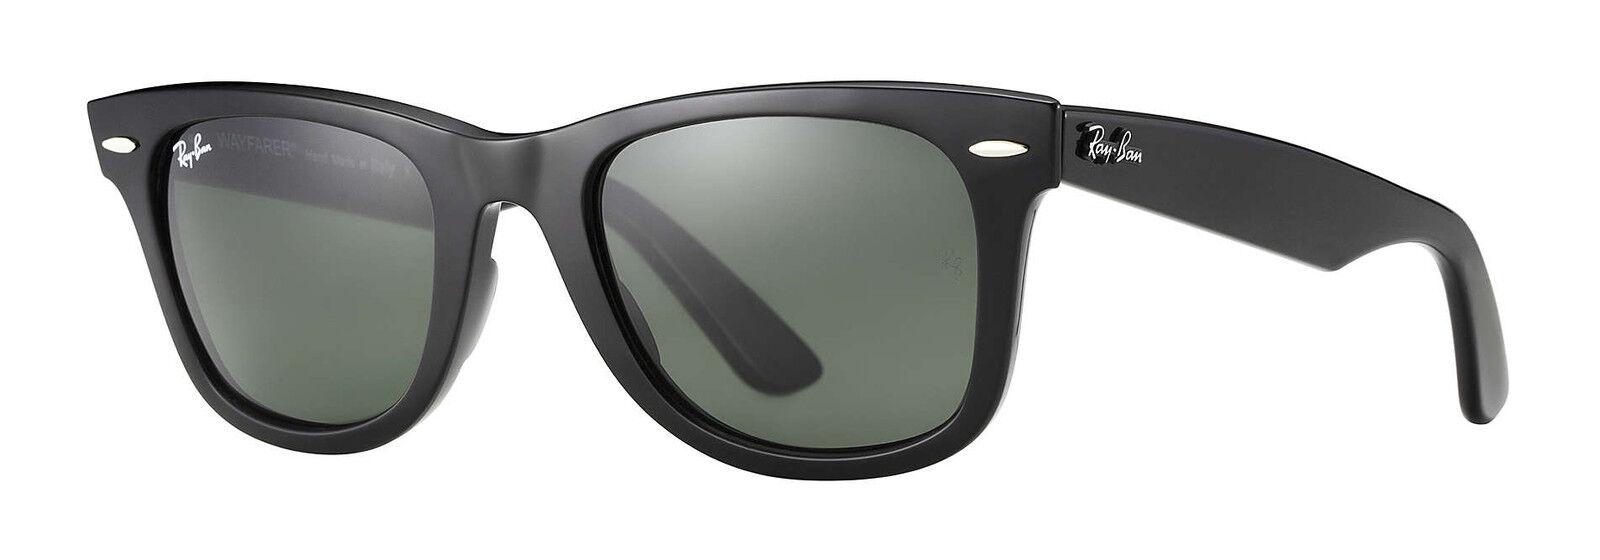 Ray-Ban RB2140 Original Wayfarer Classic 50mm Black Sunglasses   eBay 2e403922b8